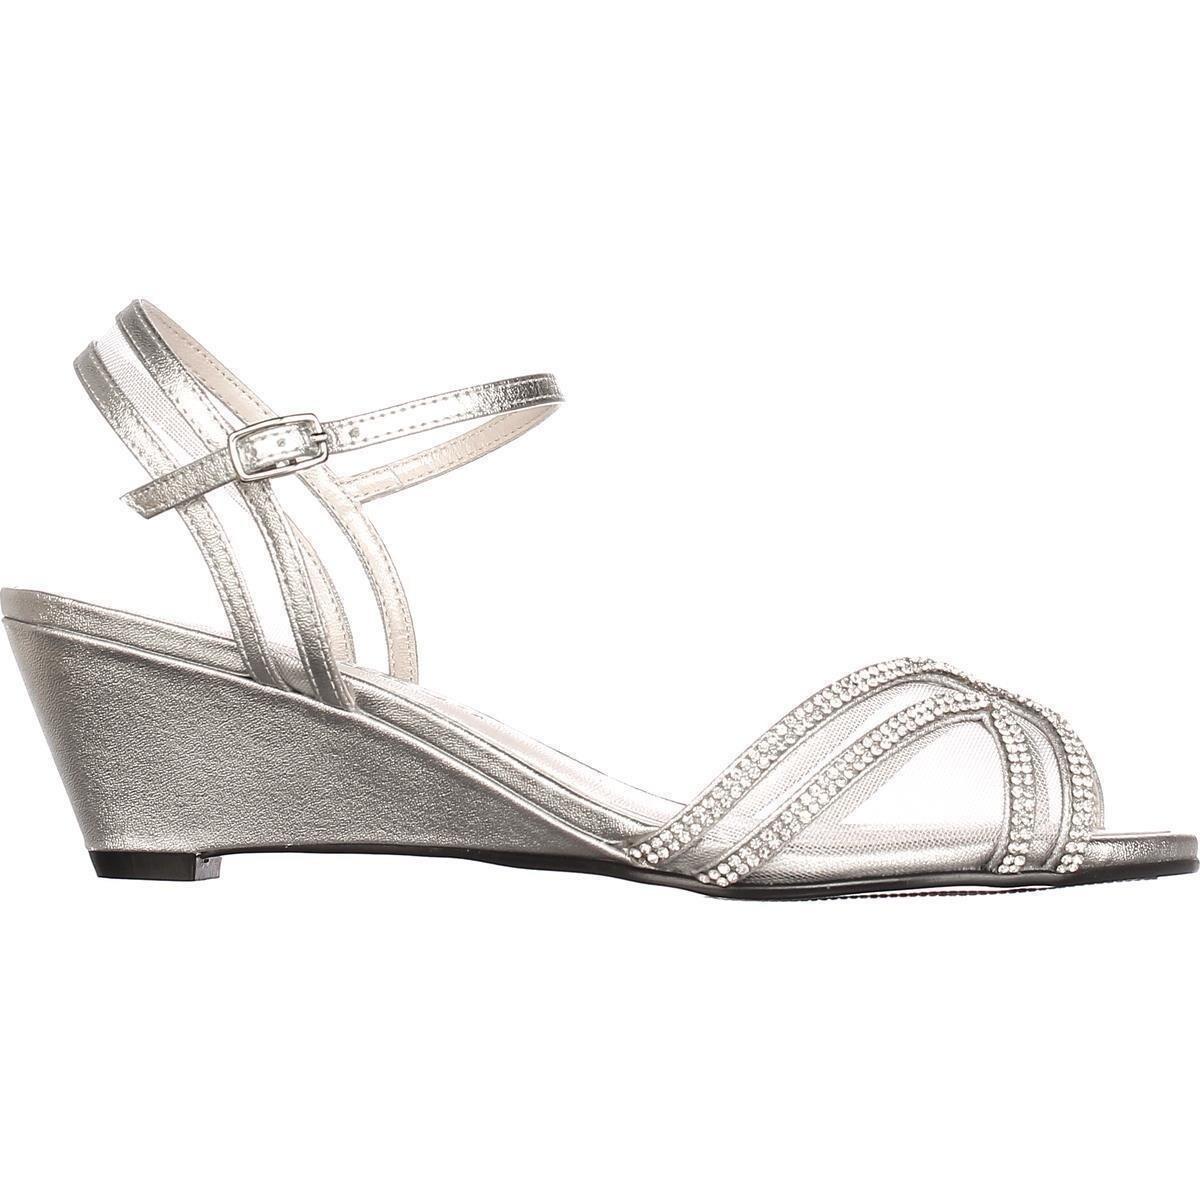 b43ac5fc9a8 Shop Caparros Hilton Low-Heel Dress Wedge Sandals